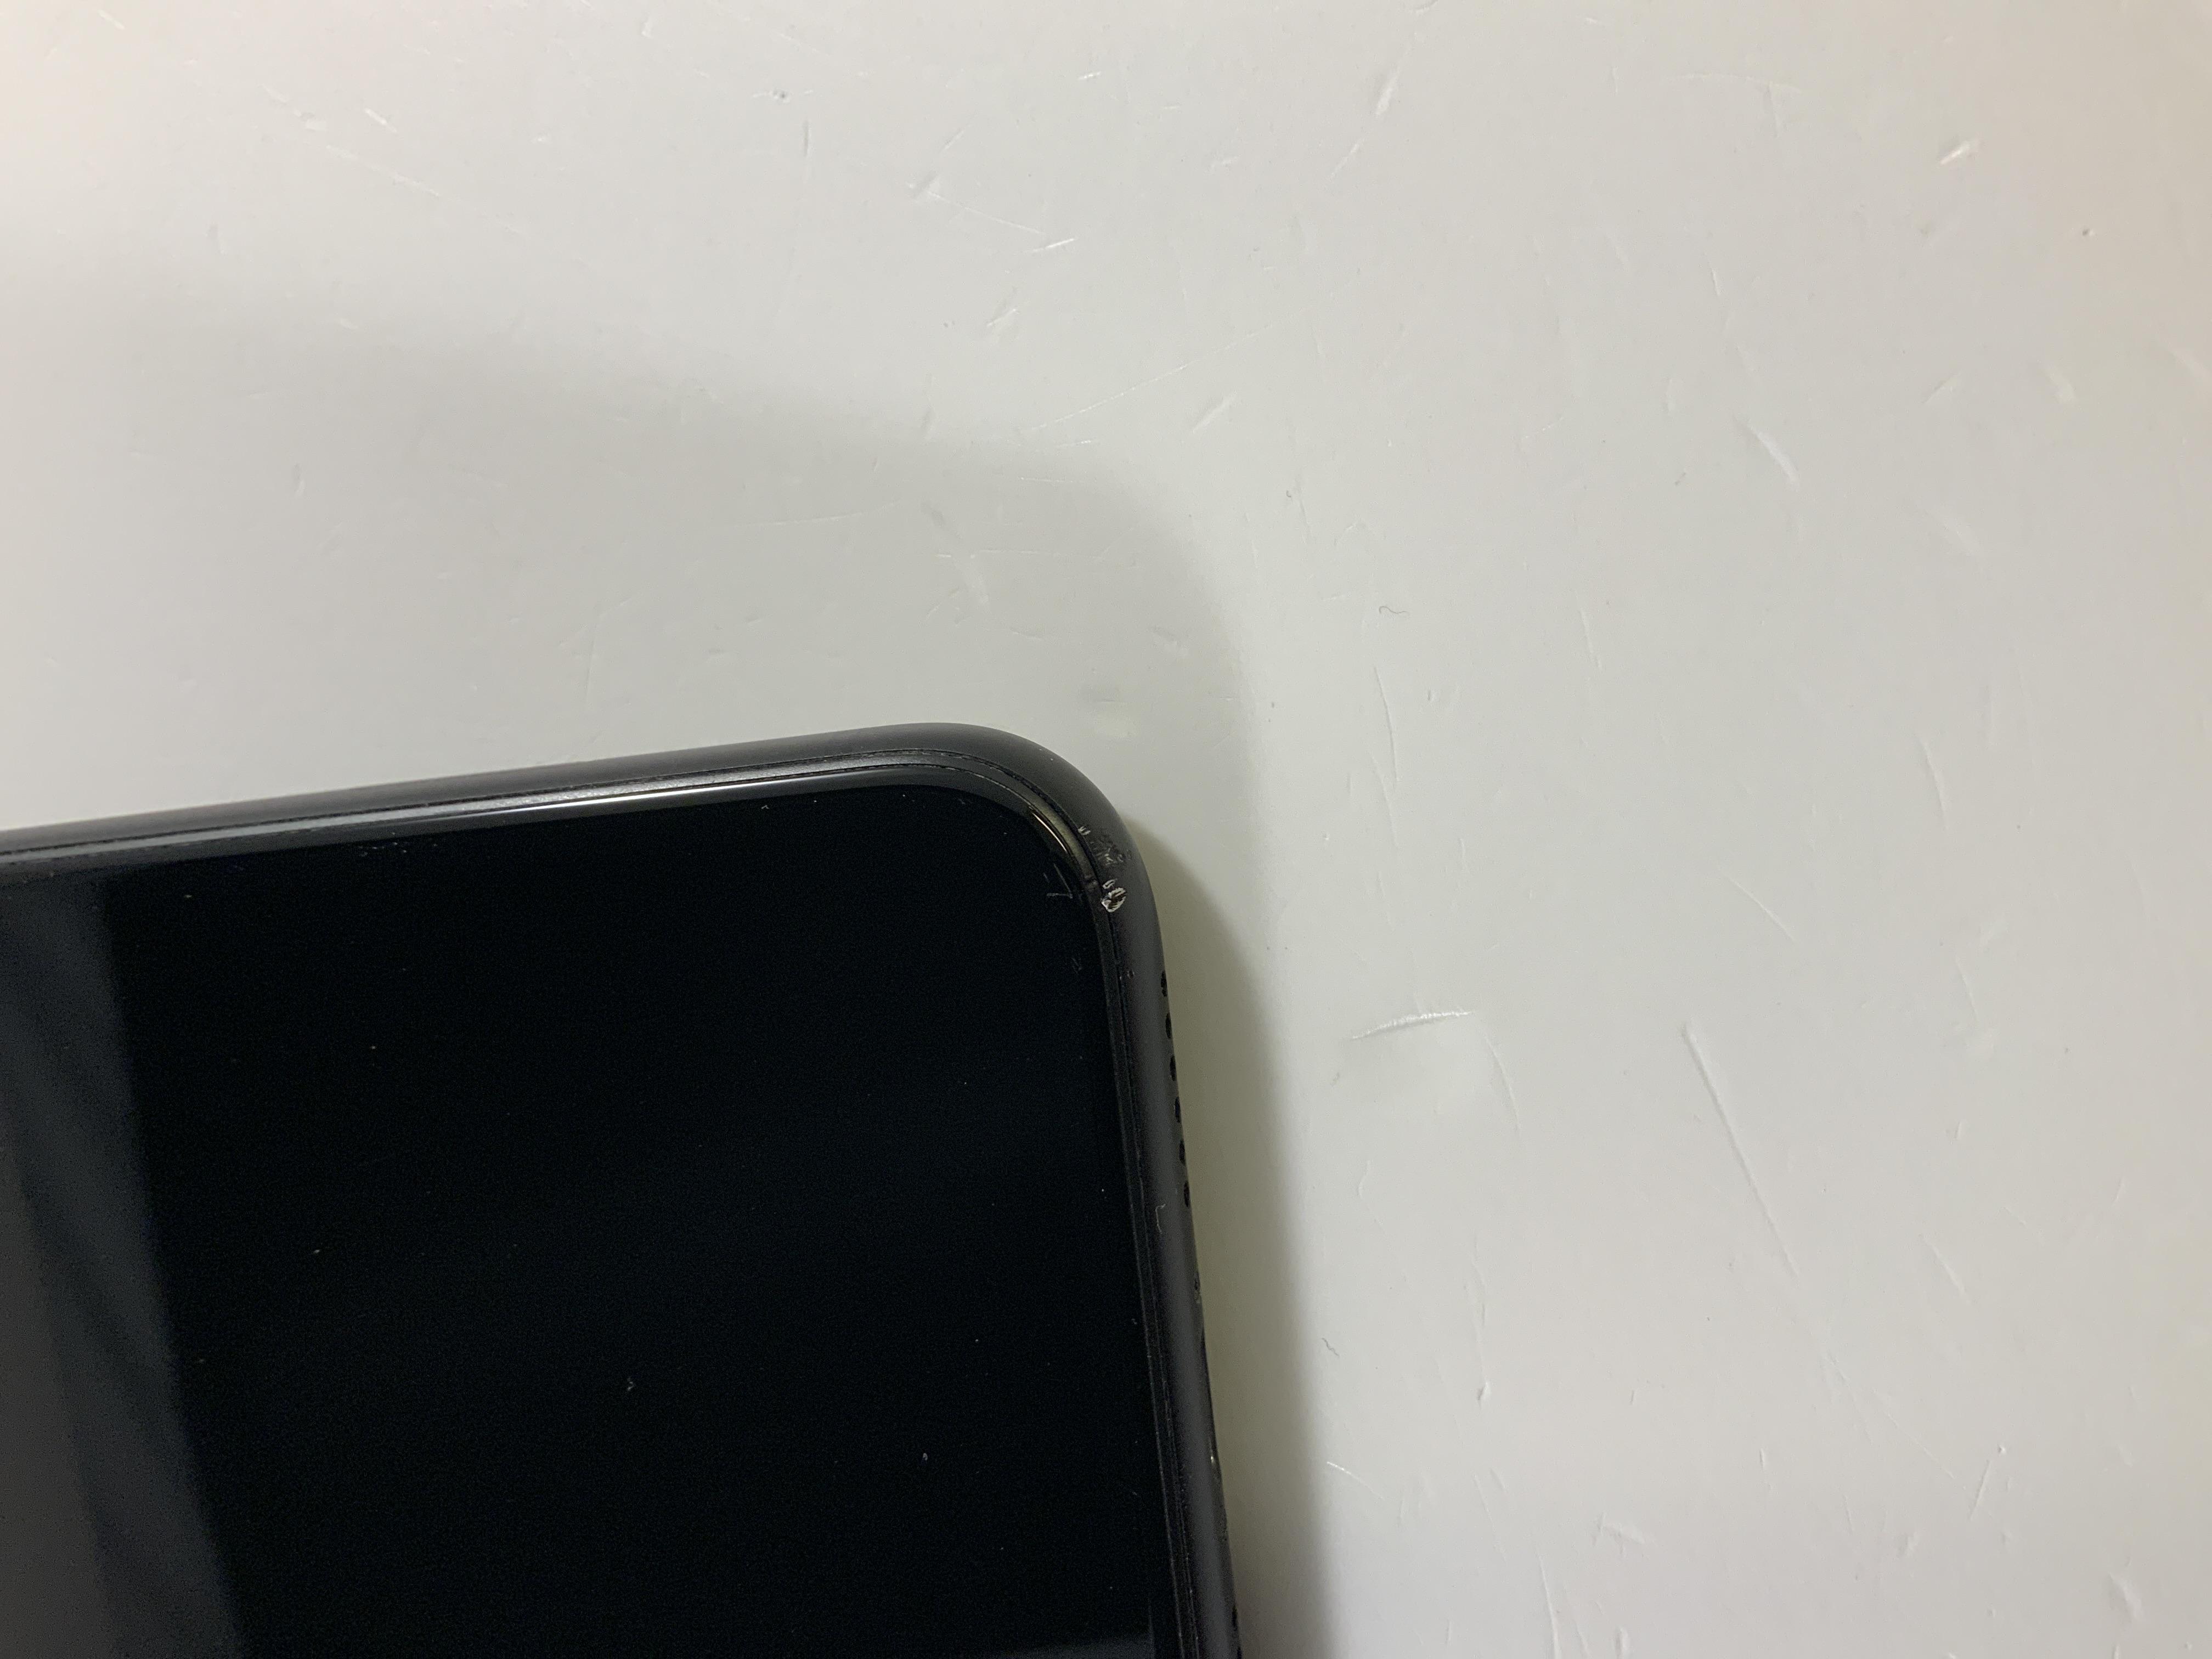 iPhone XR 128GB, 128GB, Black, Afbeelding 4